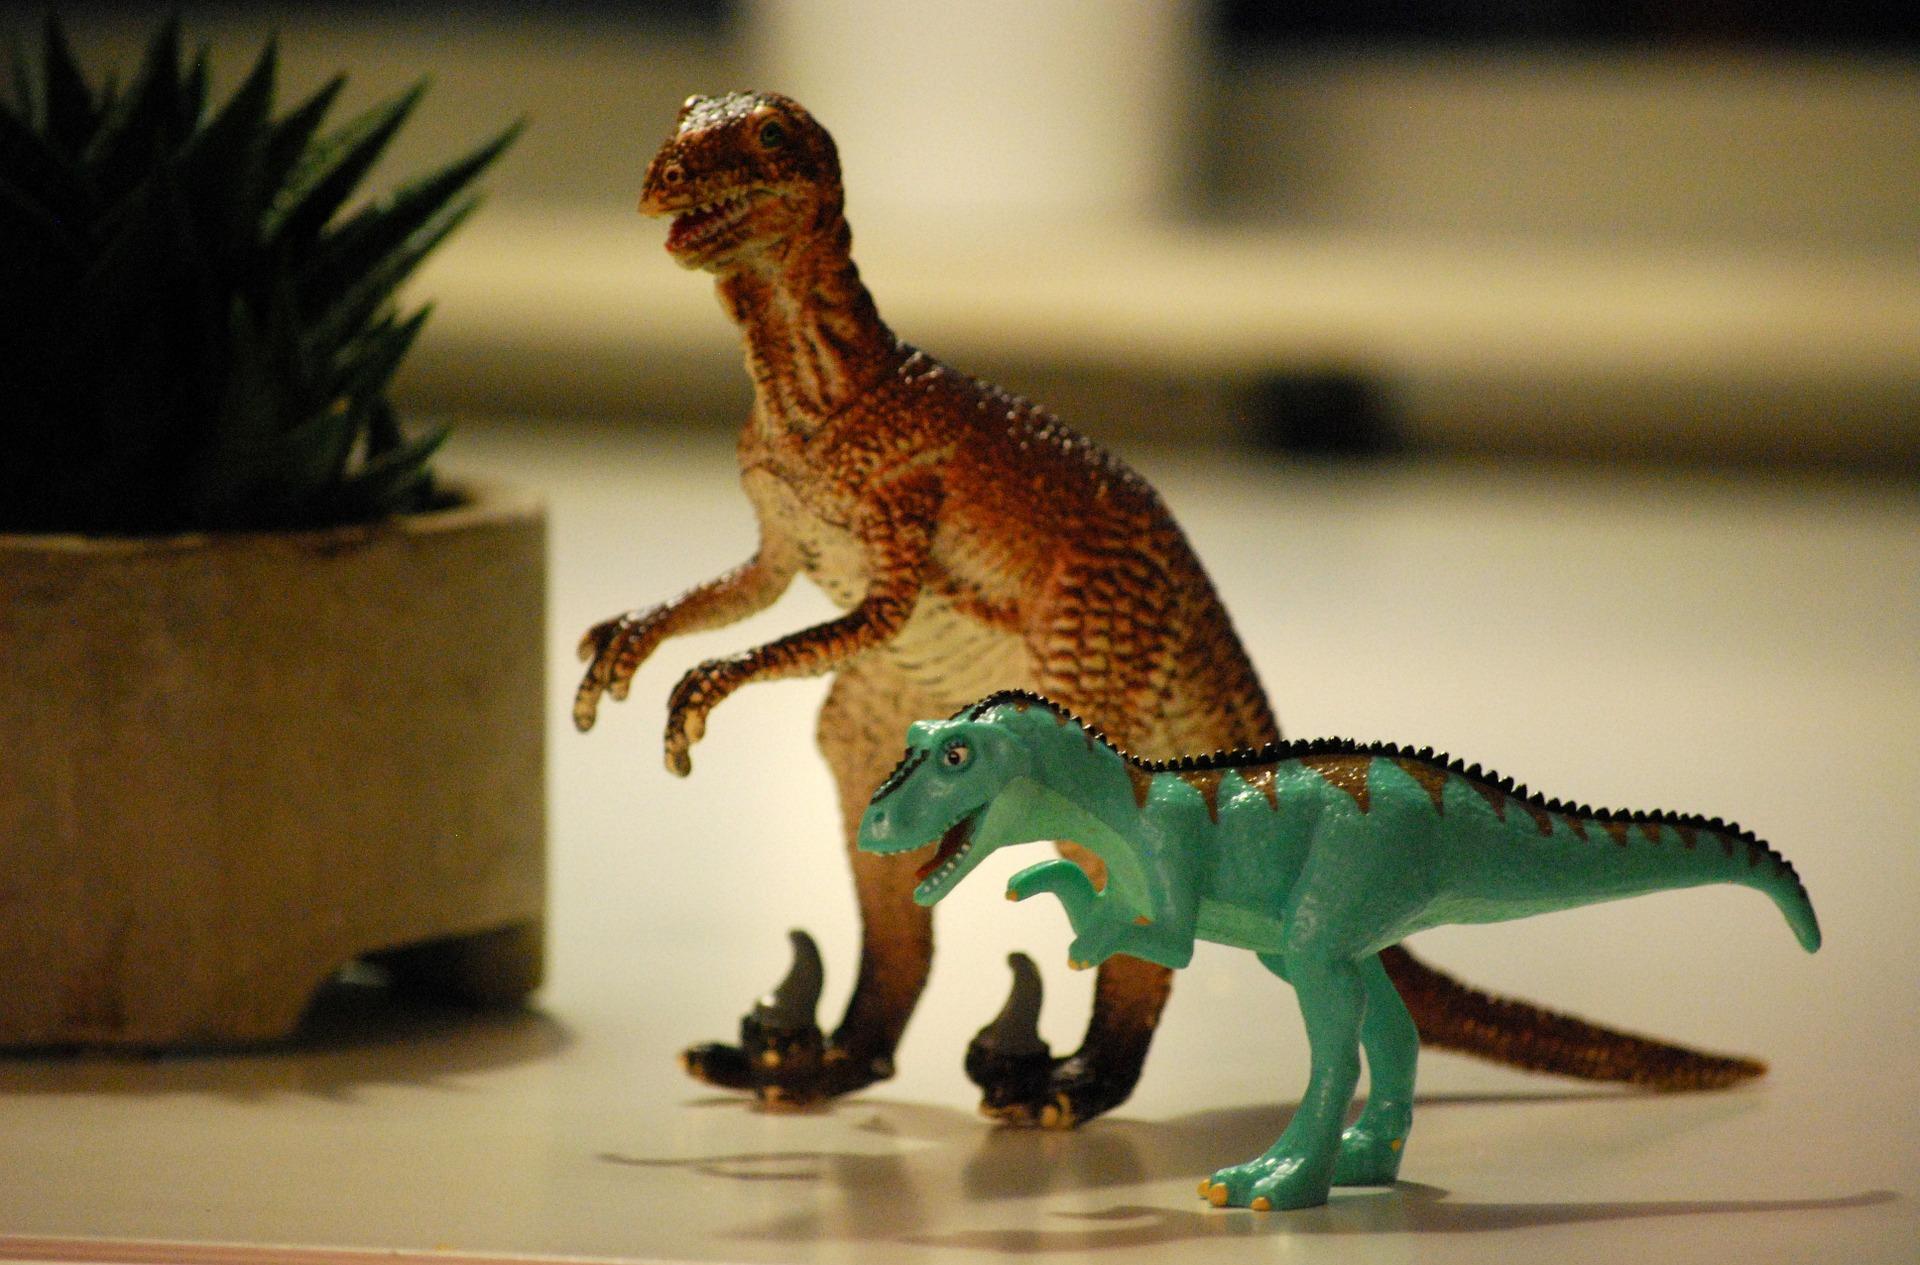 deux jouets de dinosaure en plastique